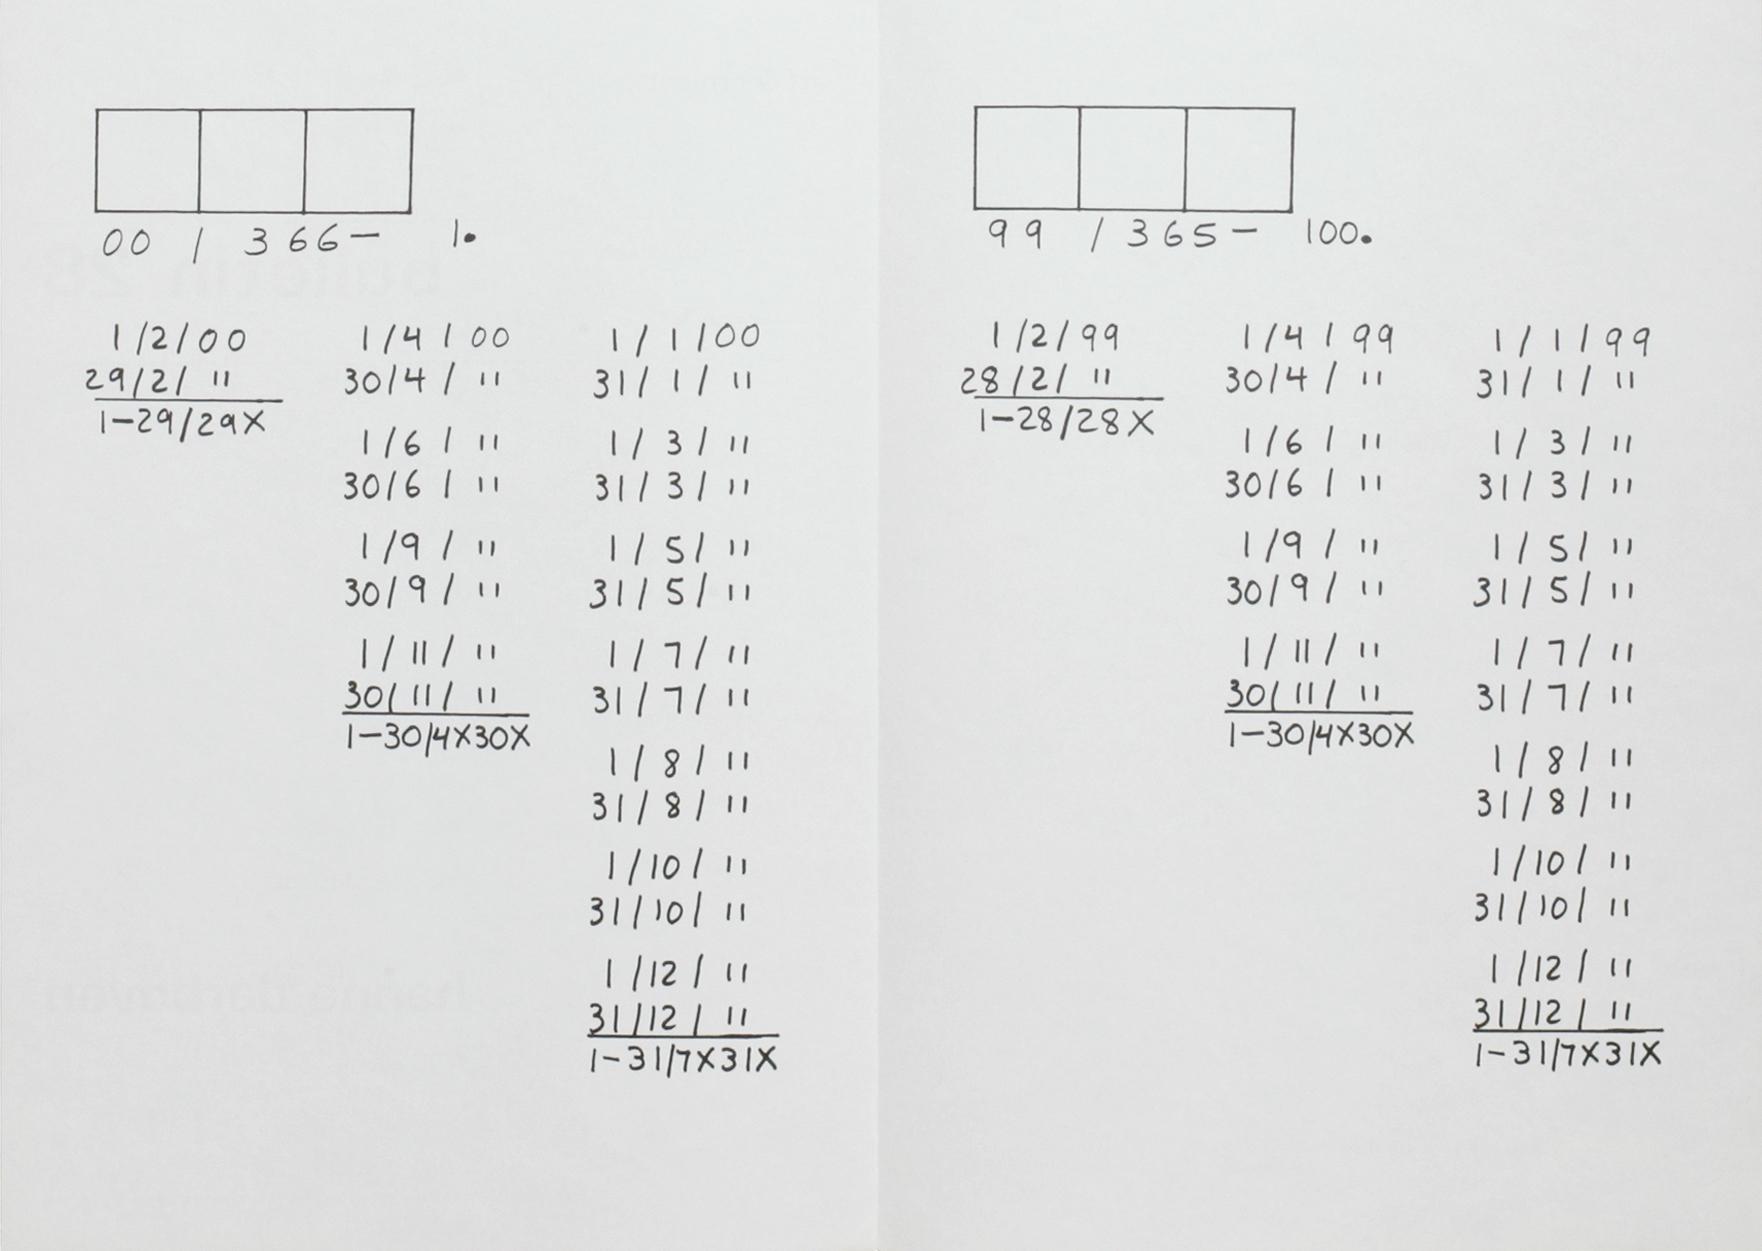 Hanne Darboven, art & project, Bulletin 28, Amsterdam, 1970 (Bulletin, Edition, Invitation); Sammlung Marzona, Kunstbibliothek – Staatliche Museen zu Berlin; © VG Bild-Kunst, Bonn